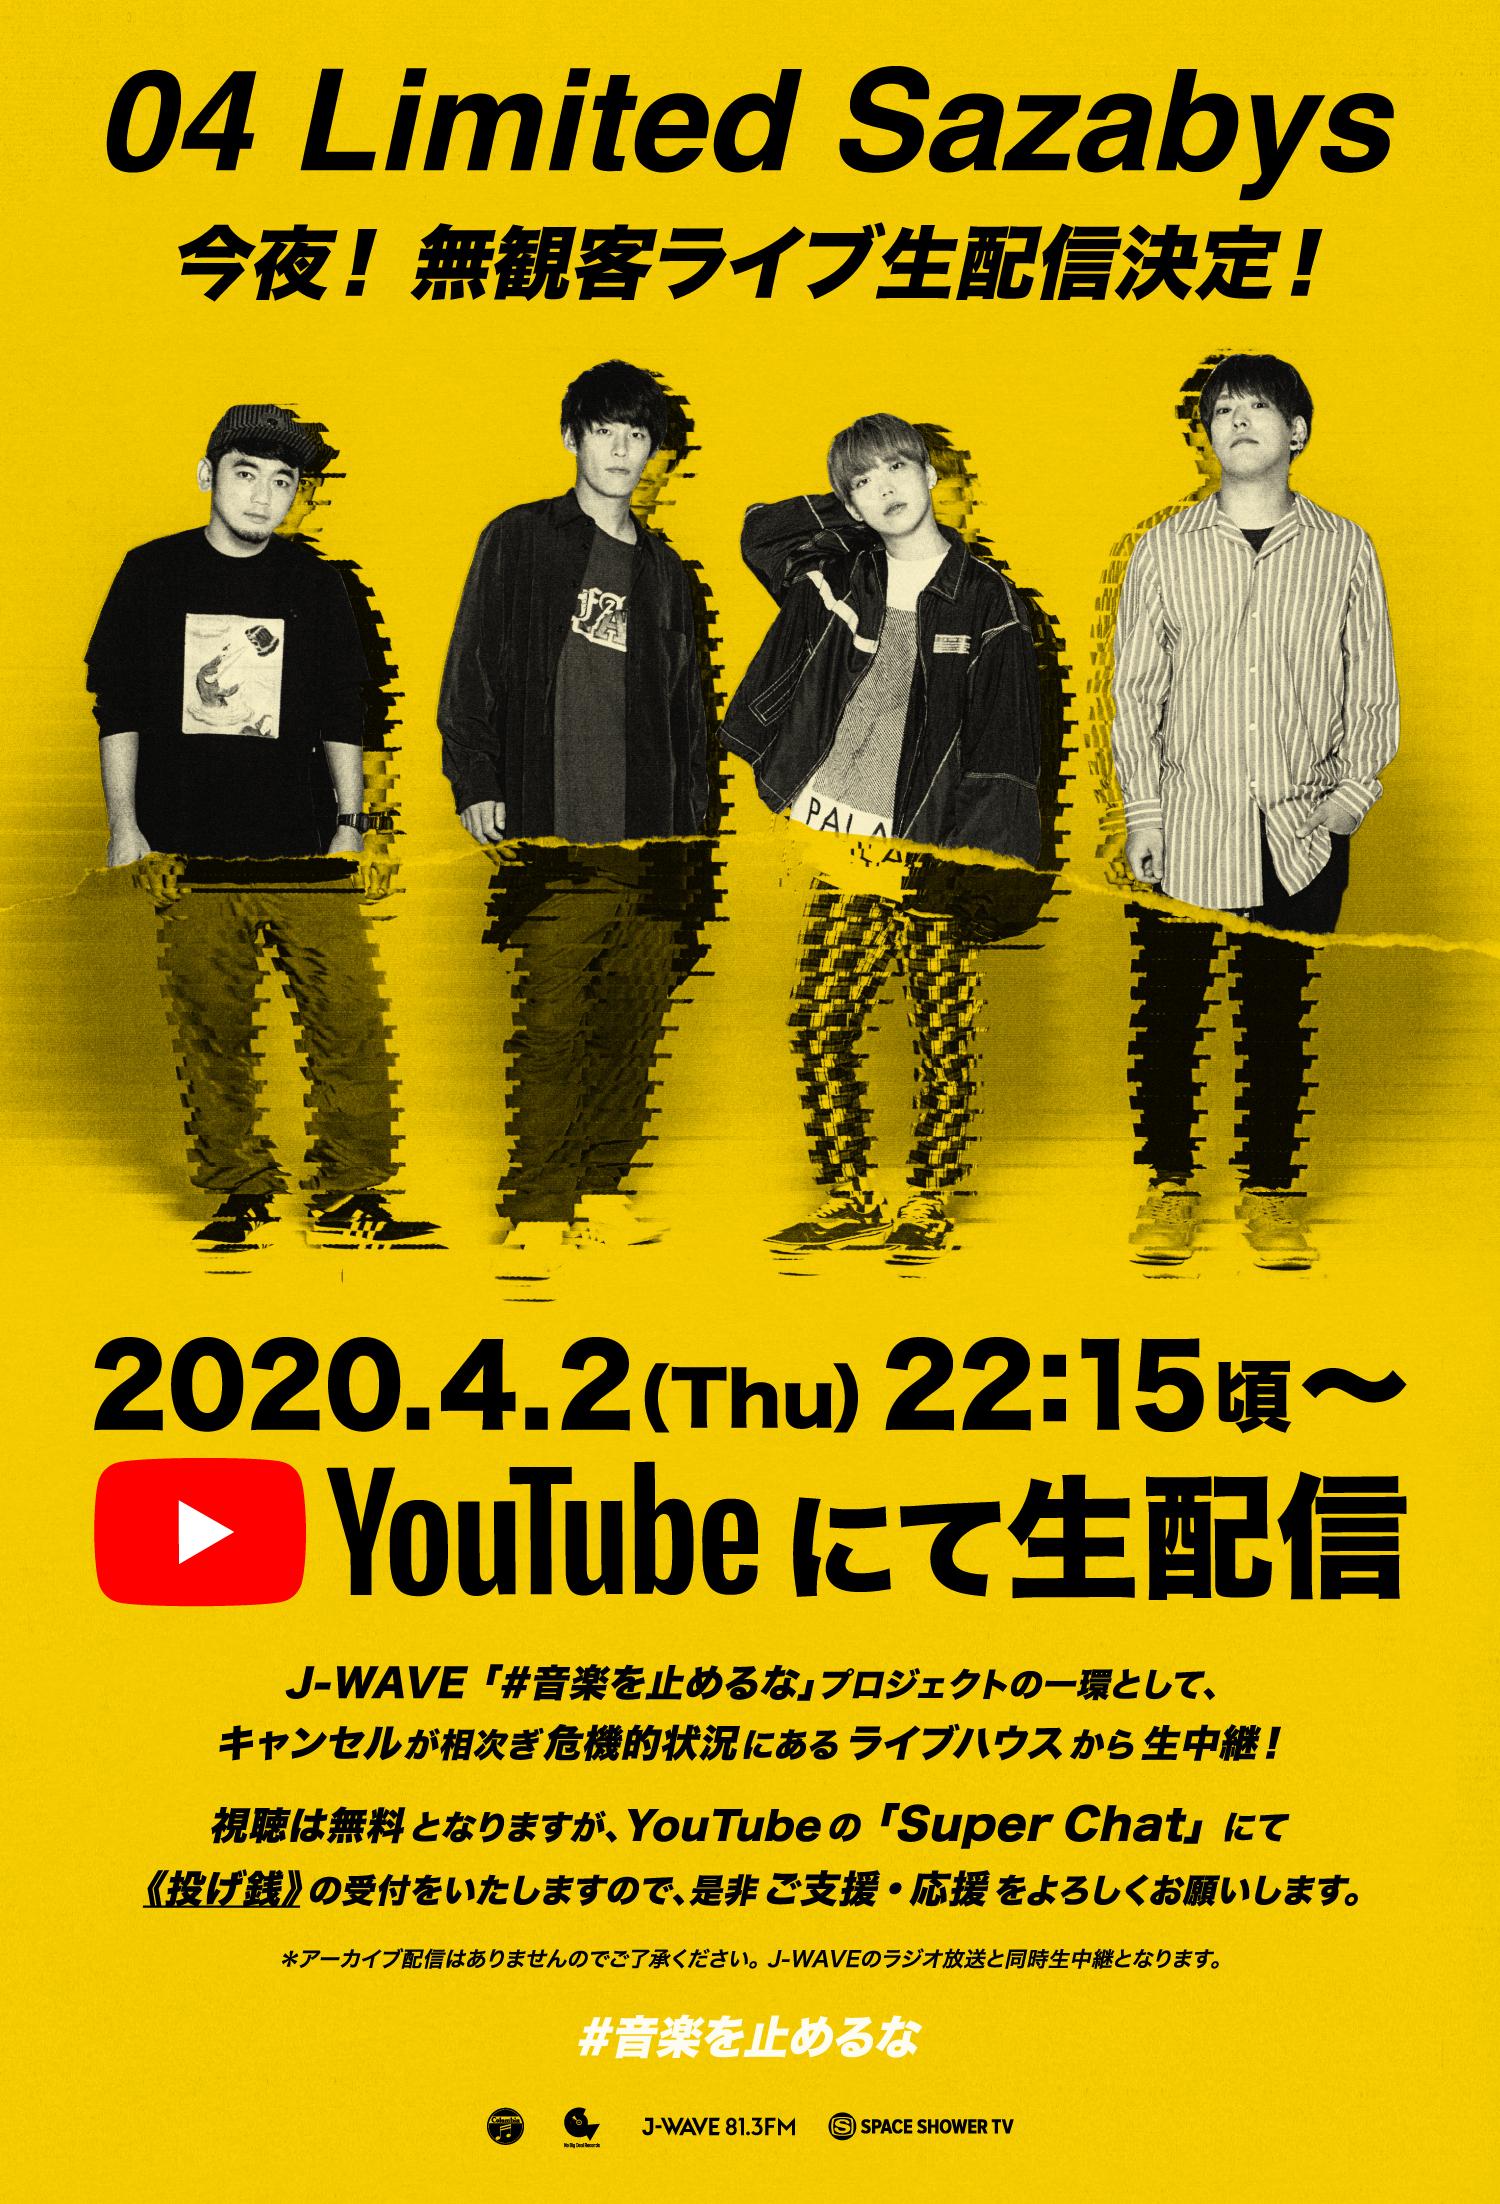 4/2 YouTubeにて無観客ライブ生配信決定!